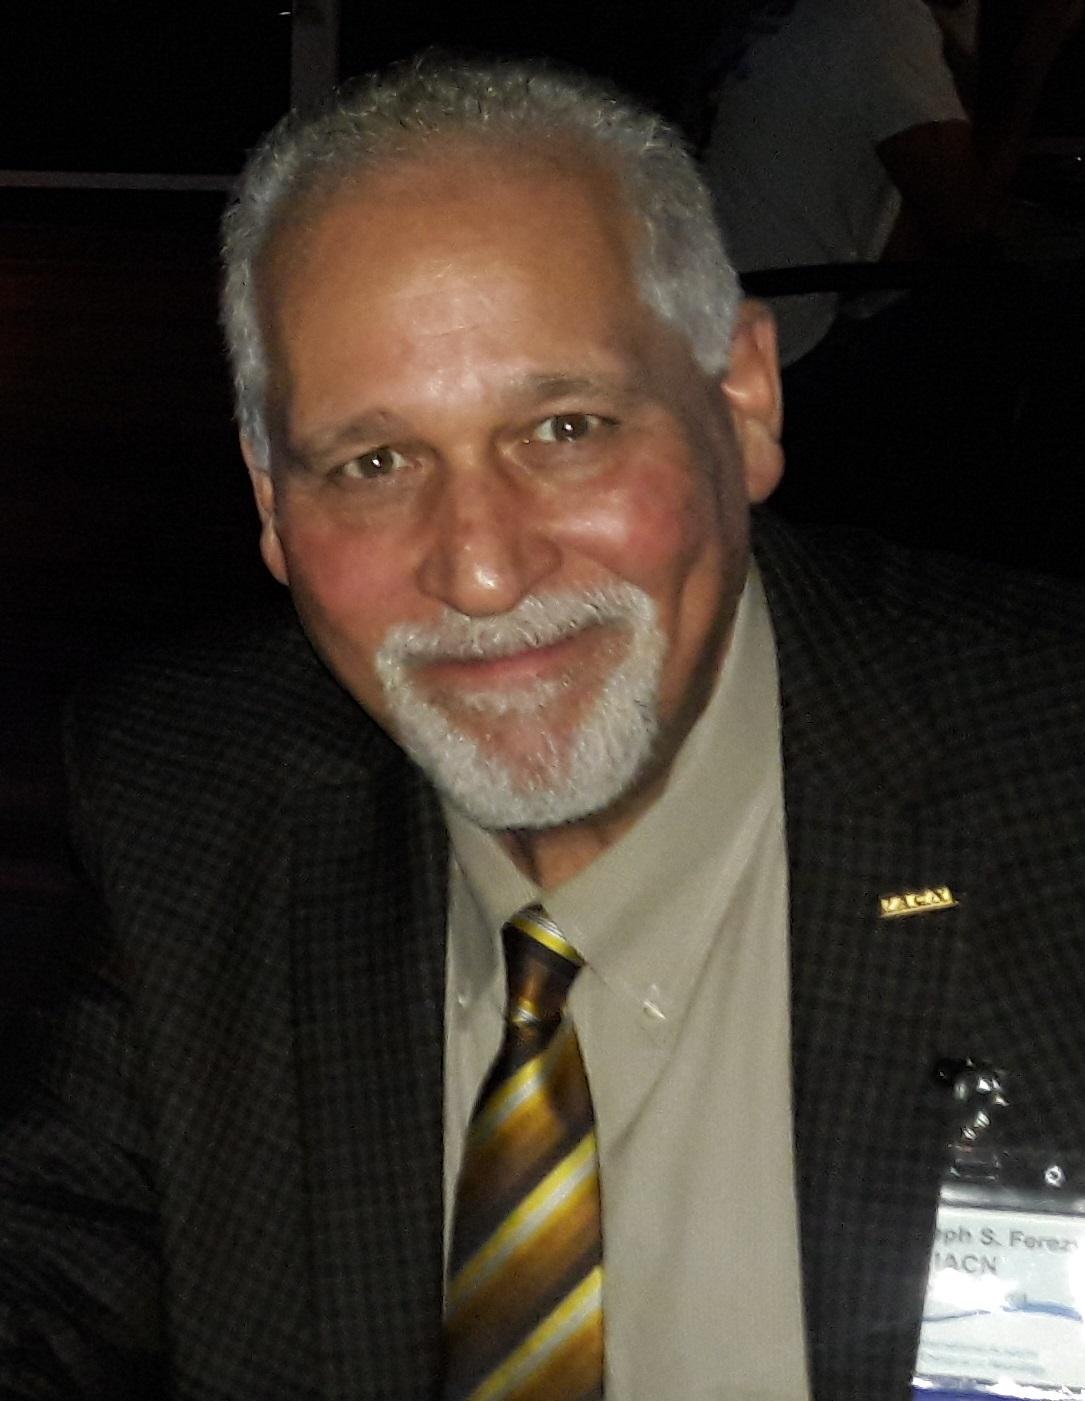 Joseph S. Ferezy